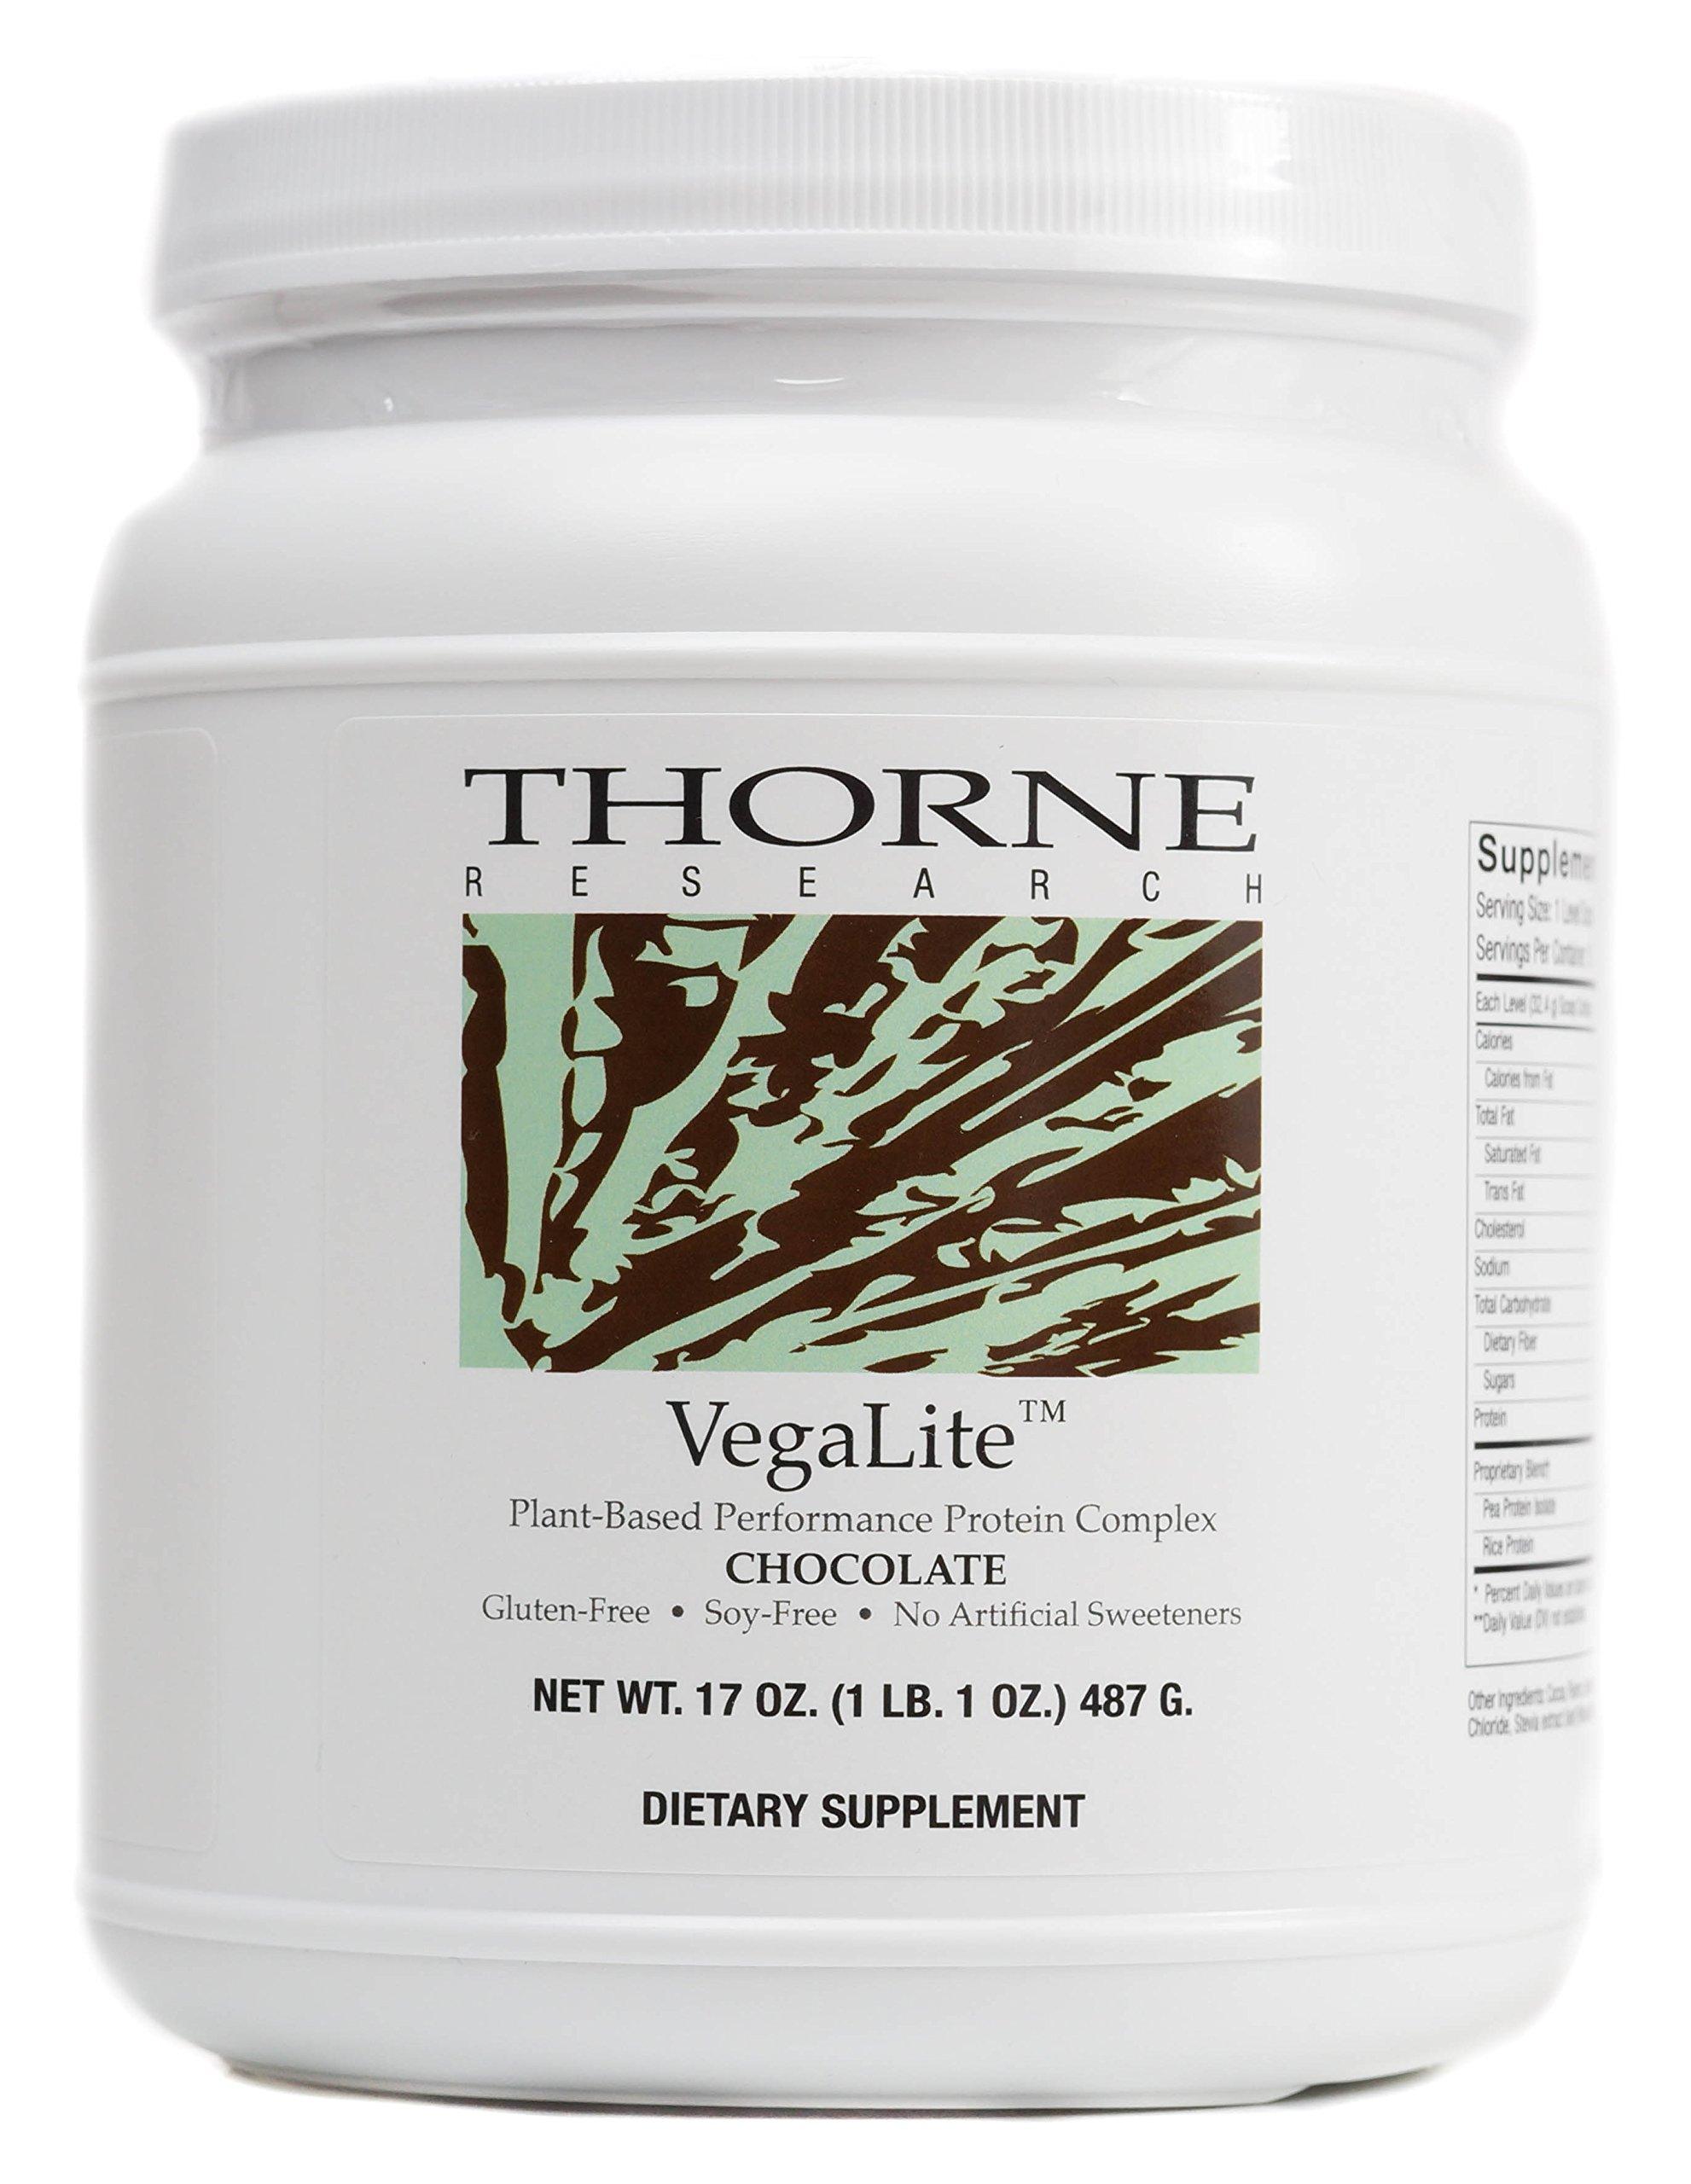 Thorne Research - VegaLite - Vegan-Friendly Performance Protein Powder - Chocolate Flavor - 17 oz